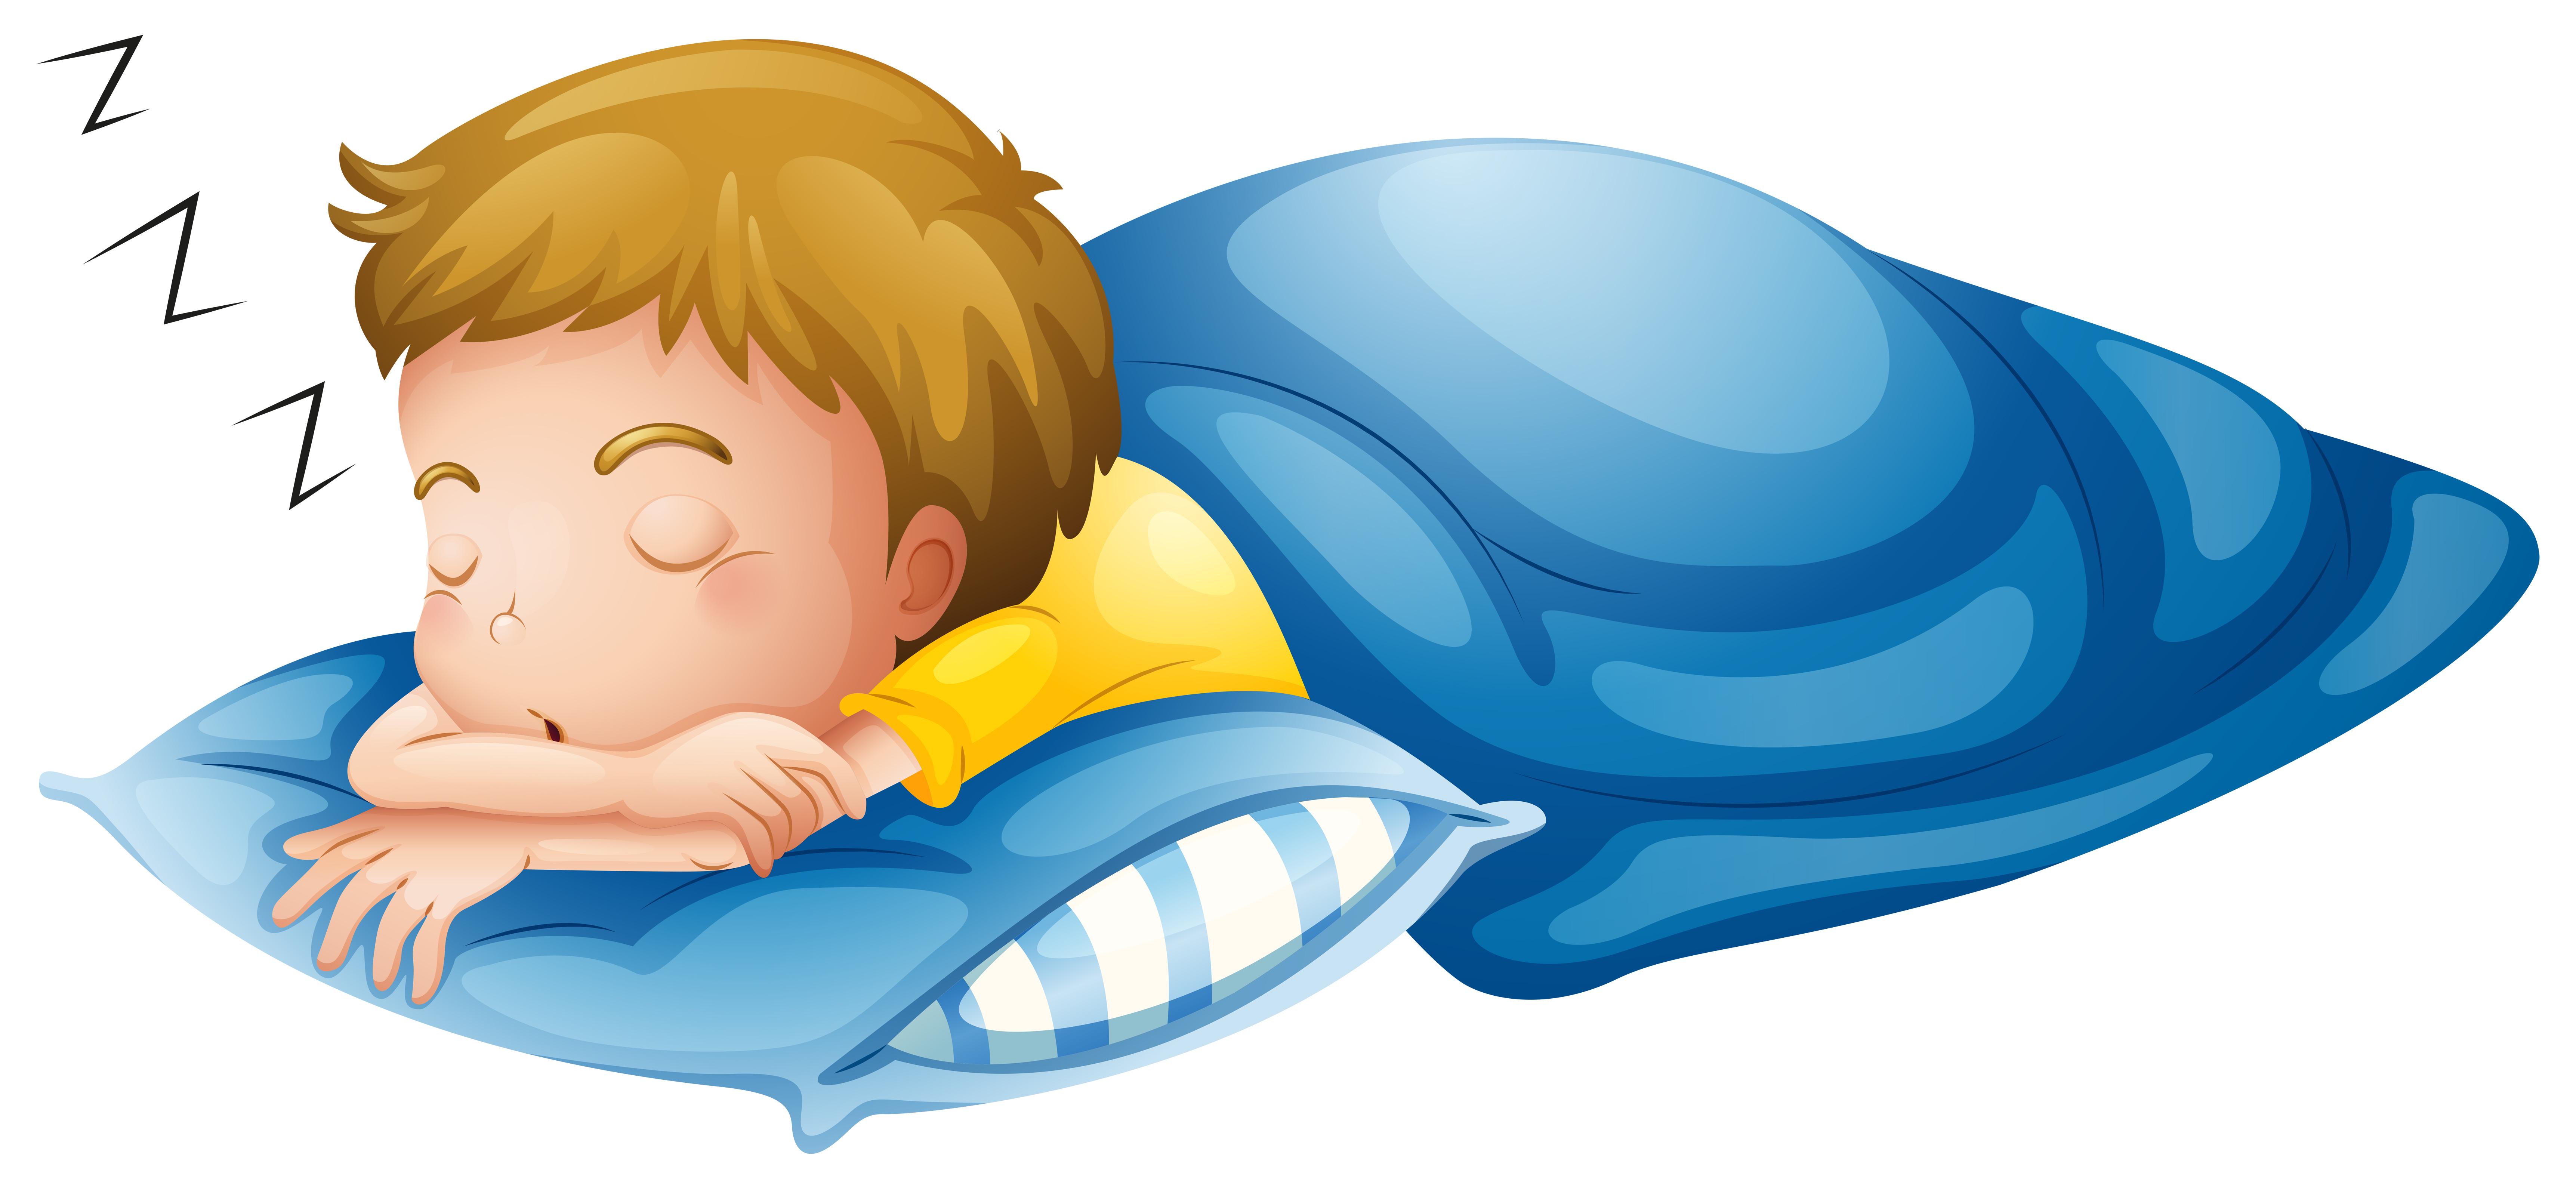 A little boy sleeping - Download Free Vectors, Clipart